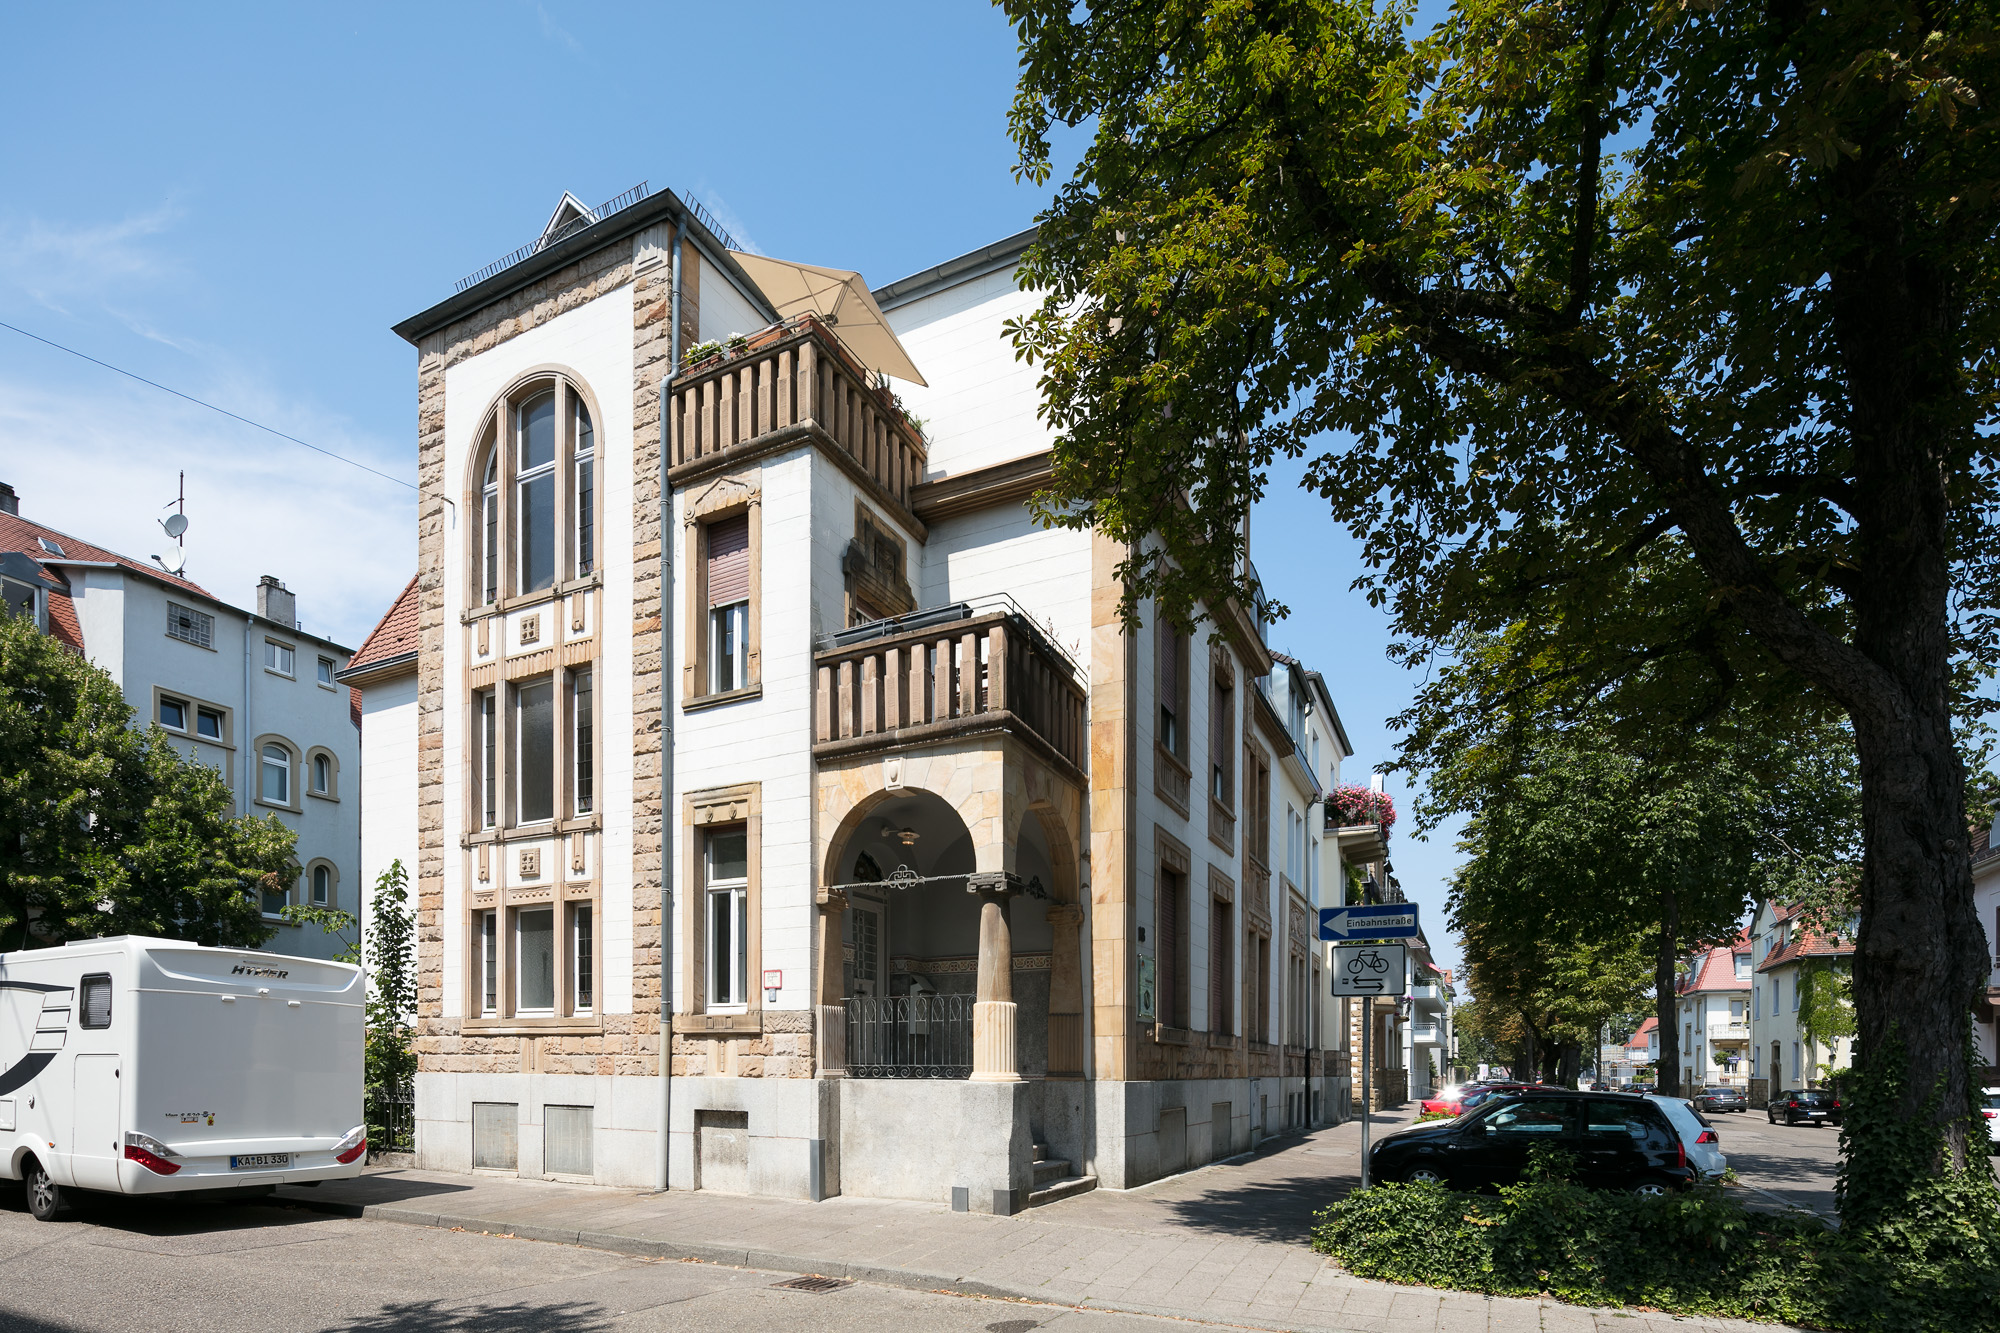 Händelstraße Karlsruhe